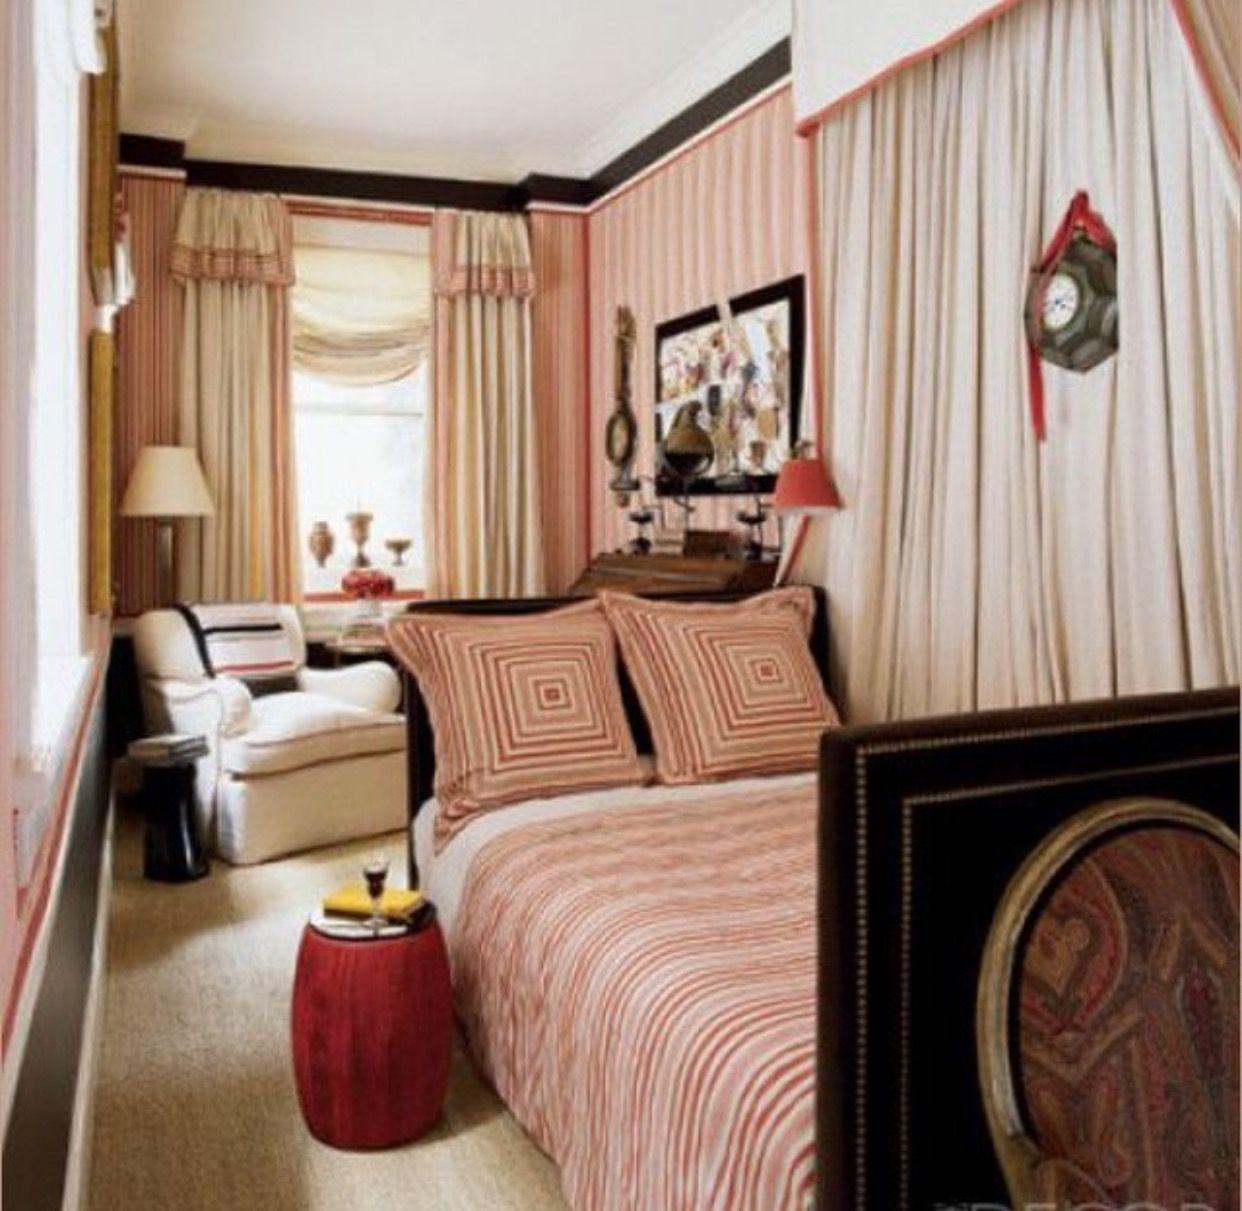 Long Narrow Room Layout Middle Bedroom Narrow Bedroom Bedroom